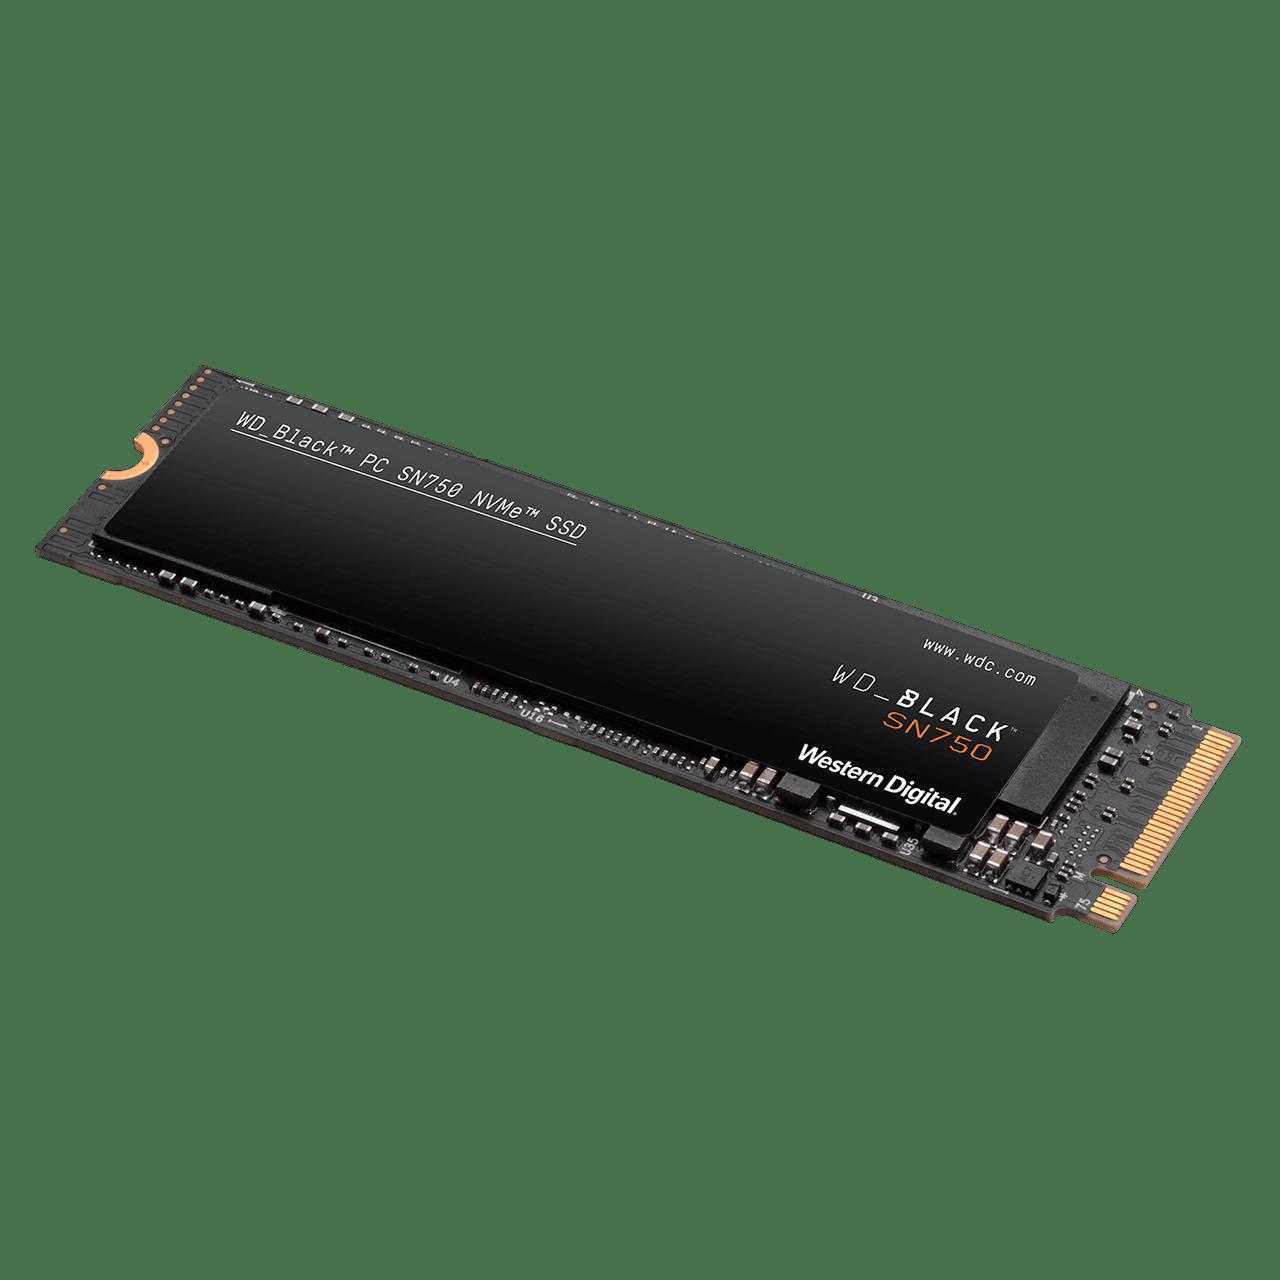 WD_BLACK SN750 NVMe SSD 2 TB w/o Heatsink & Game Awards Jacket $305.99 + Free Shipping